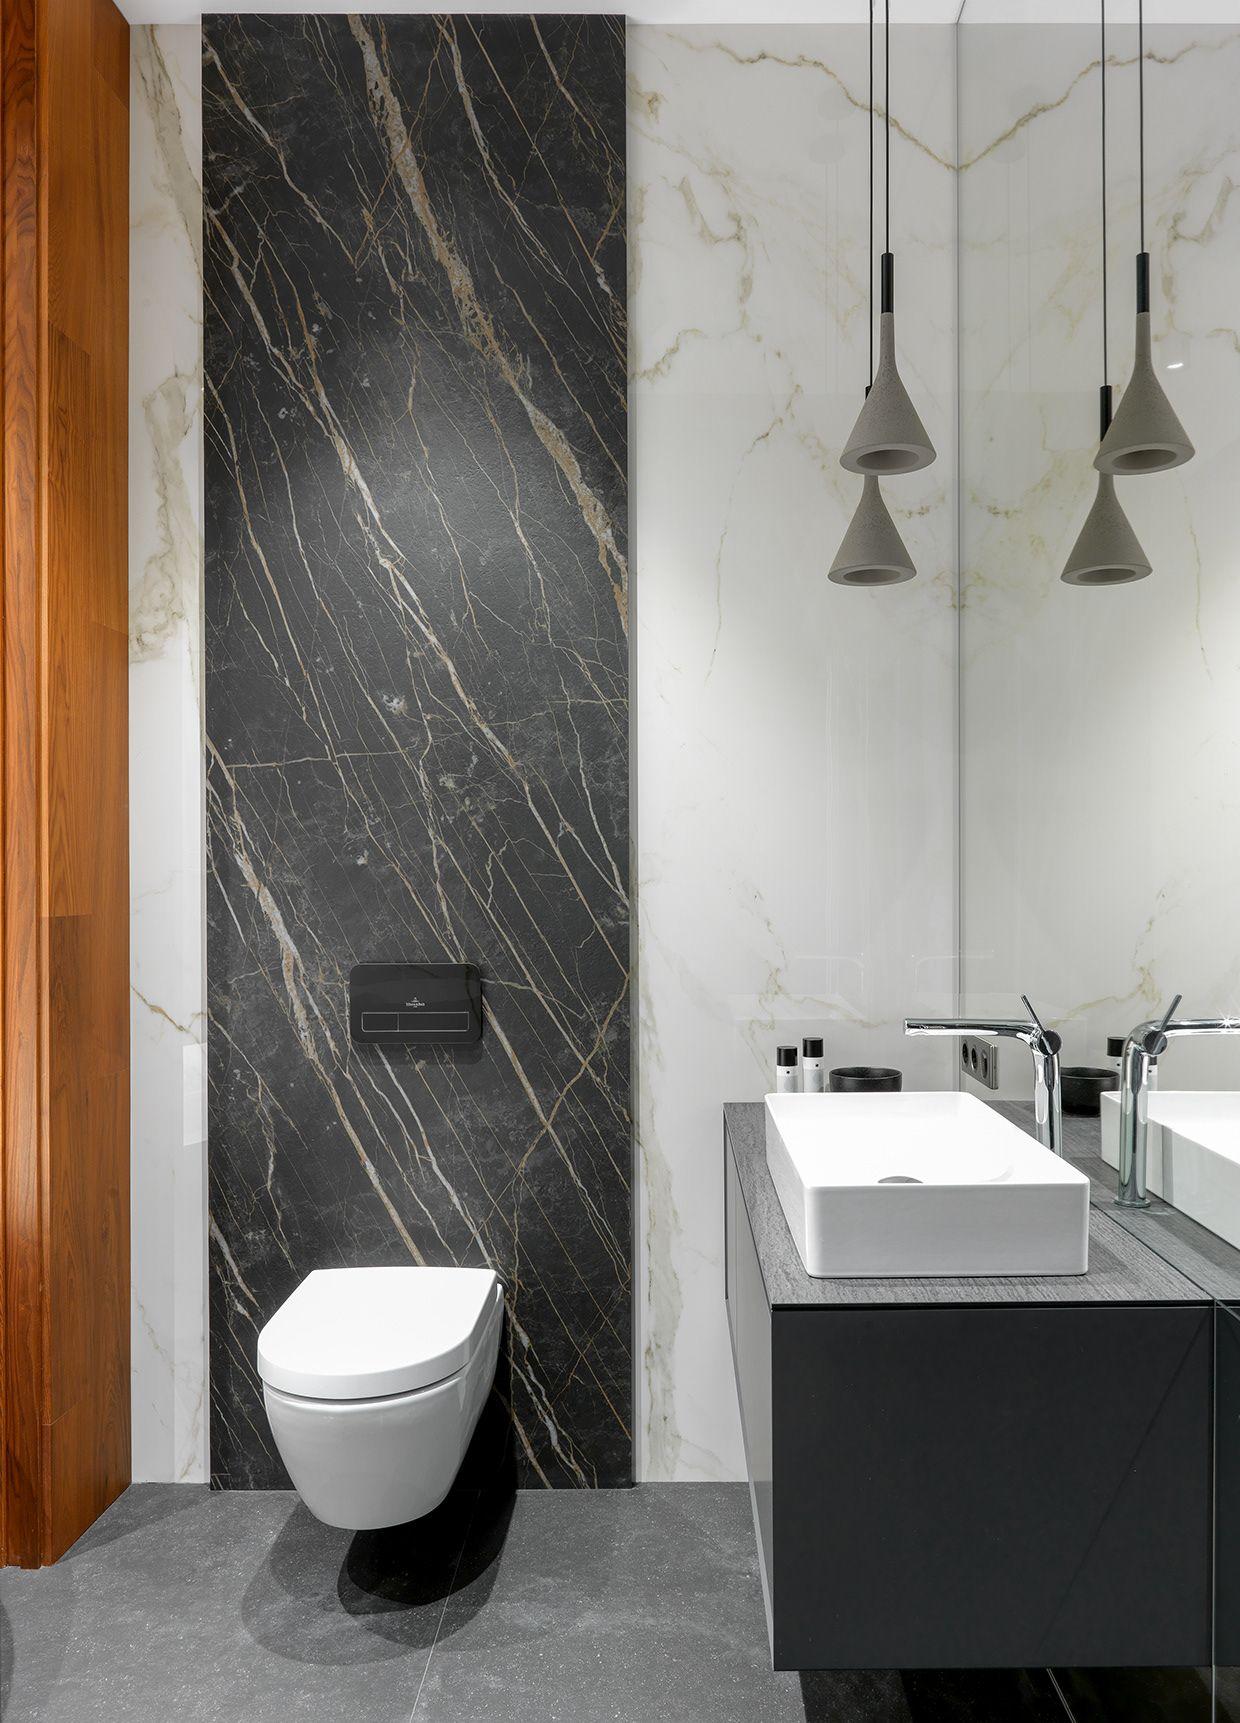 97179765360205 5af1bb0d94484 Jpg 1240 1723 Bathroom Interior Design Modern Bathroom Design Bathroom Design